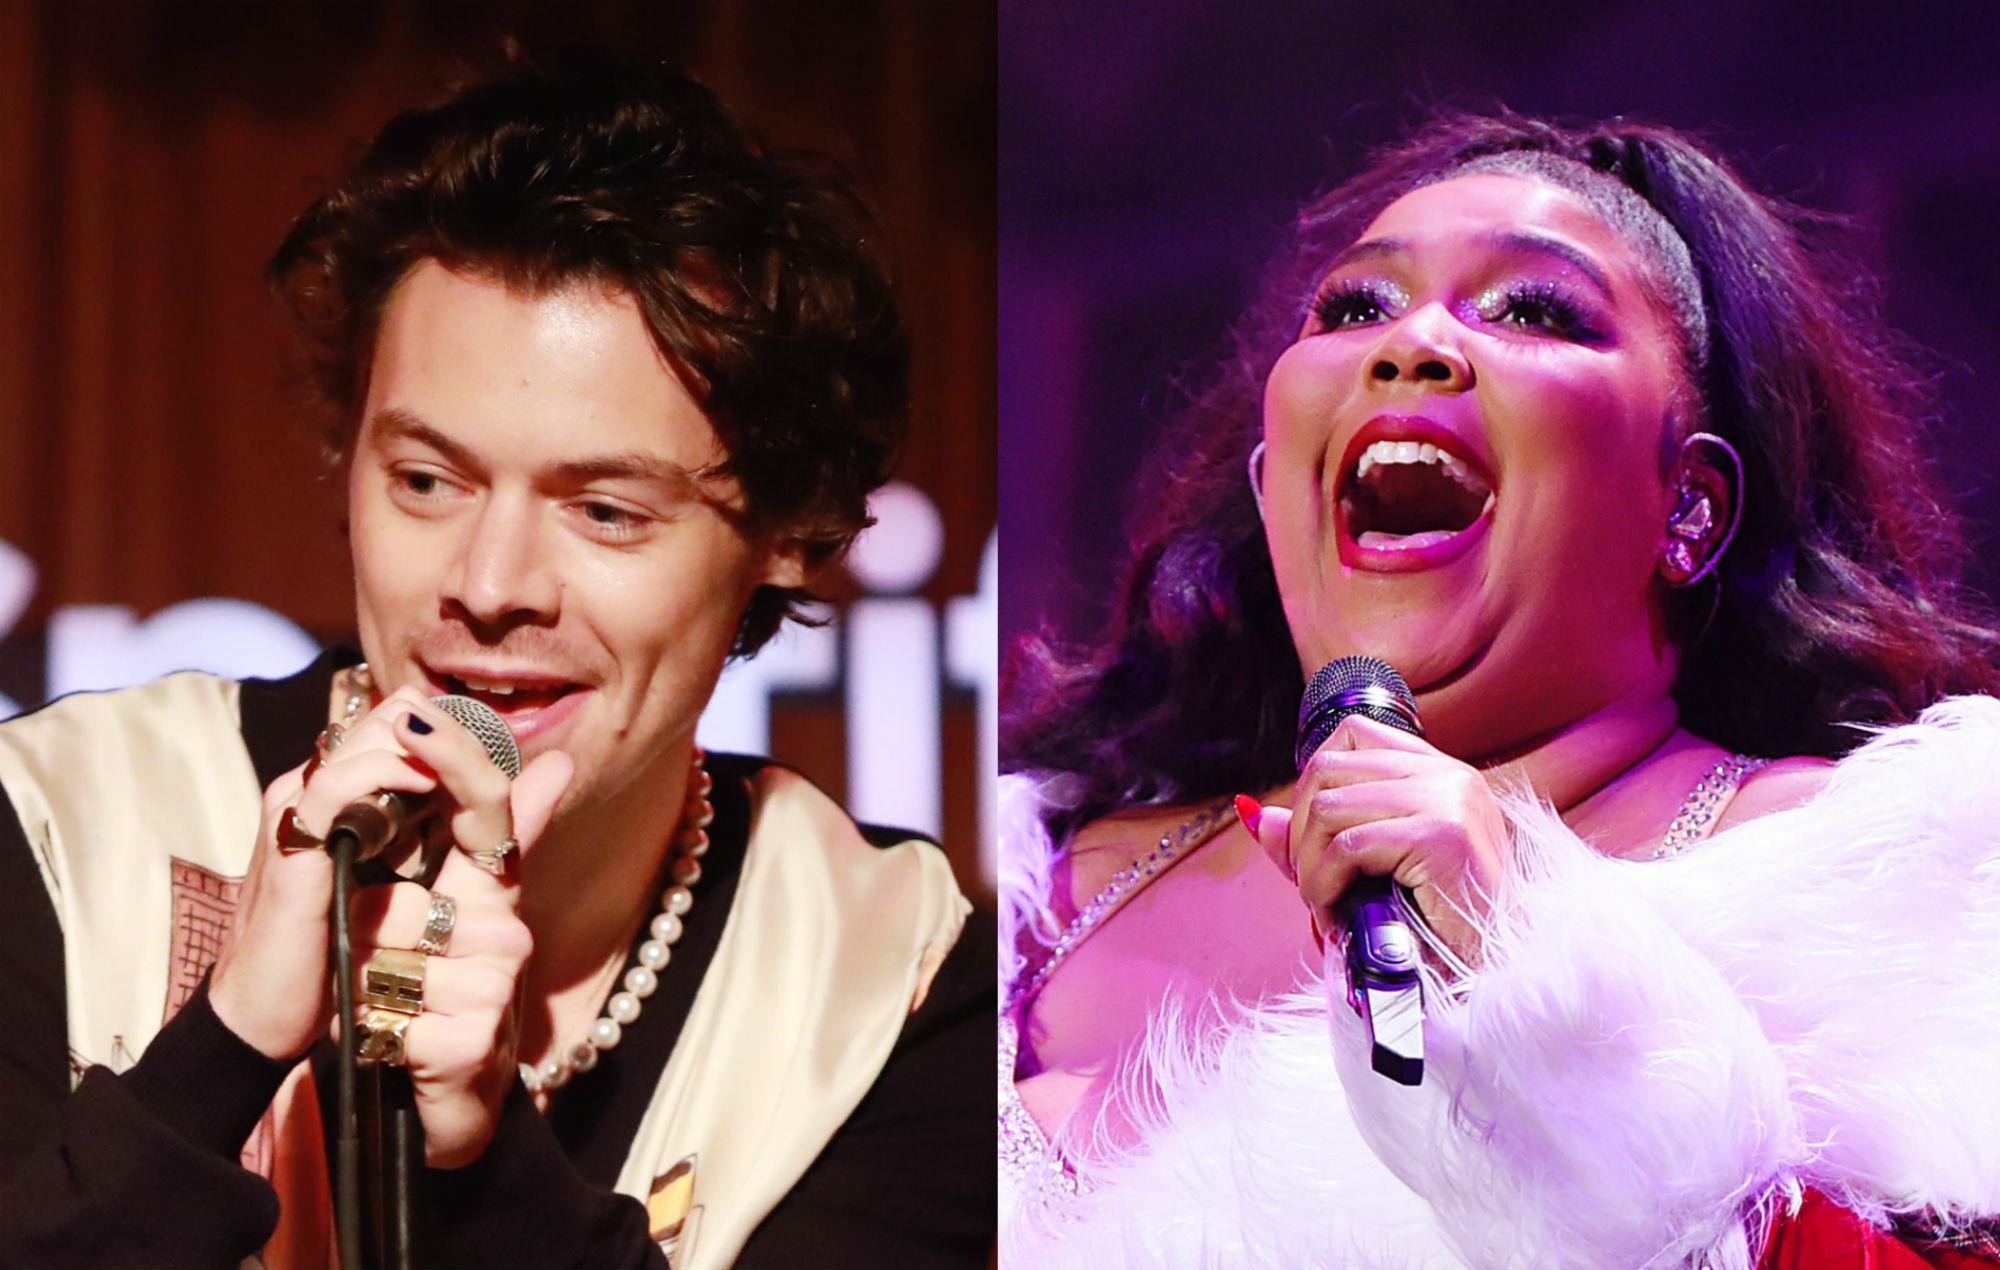 Harry Styles covers Lizzo's 'Juice'